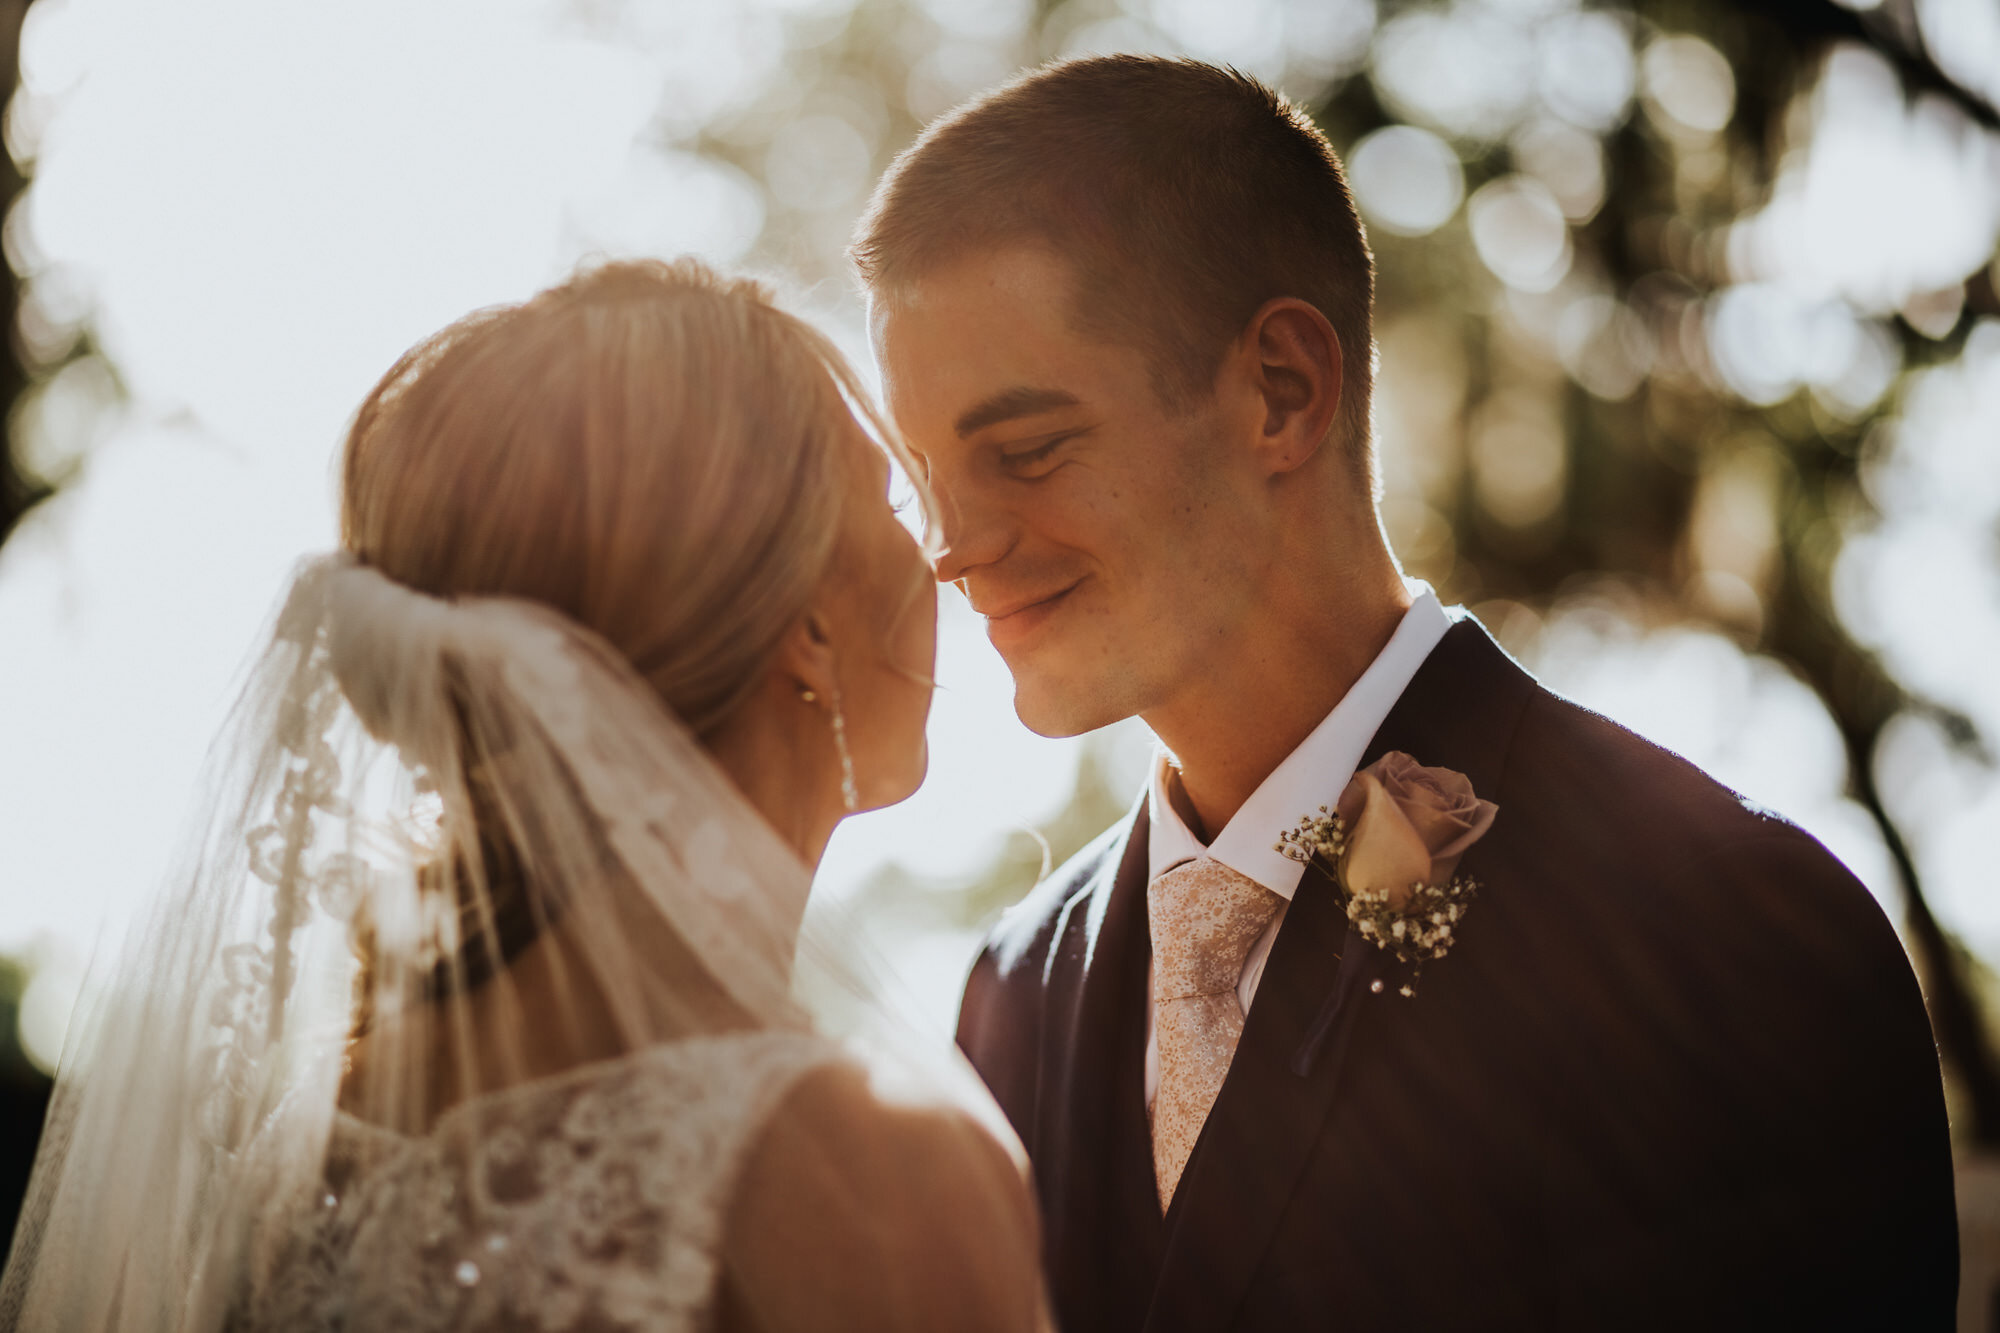 327Sean_Emily_Wedding_3-30-19.jpg